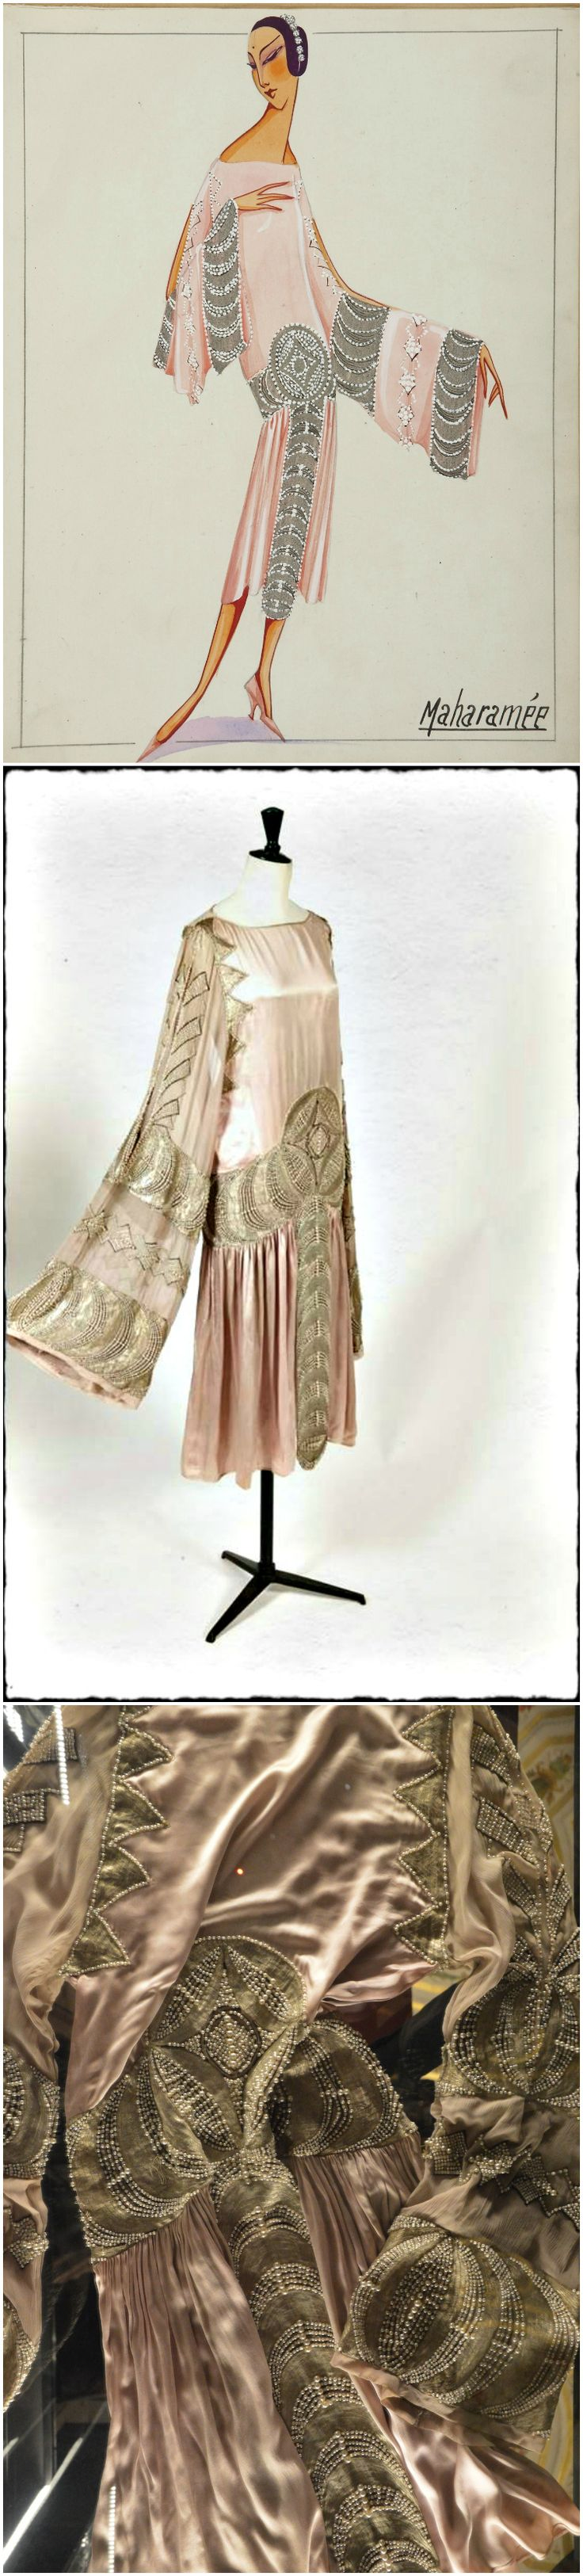 "Dress ""Maharanée,"" by Lanvin, 1925. Photos (Top): Patrimoine Lanvin / Katerina Jebb, 2014; (Middle): via LANVIN on Facebook; (Bottom): Alain R. Truong."